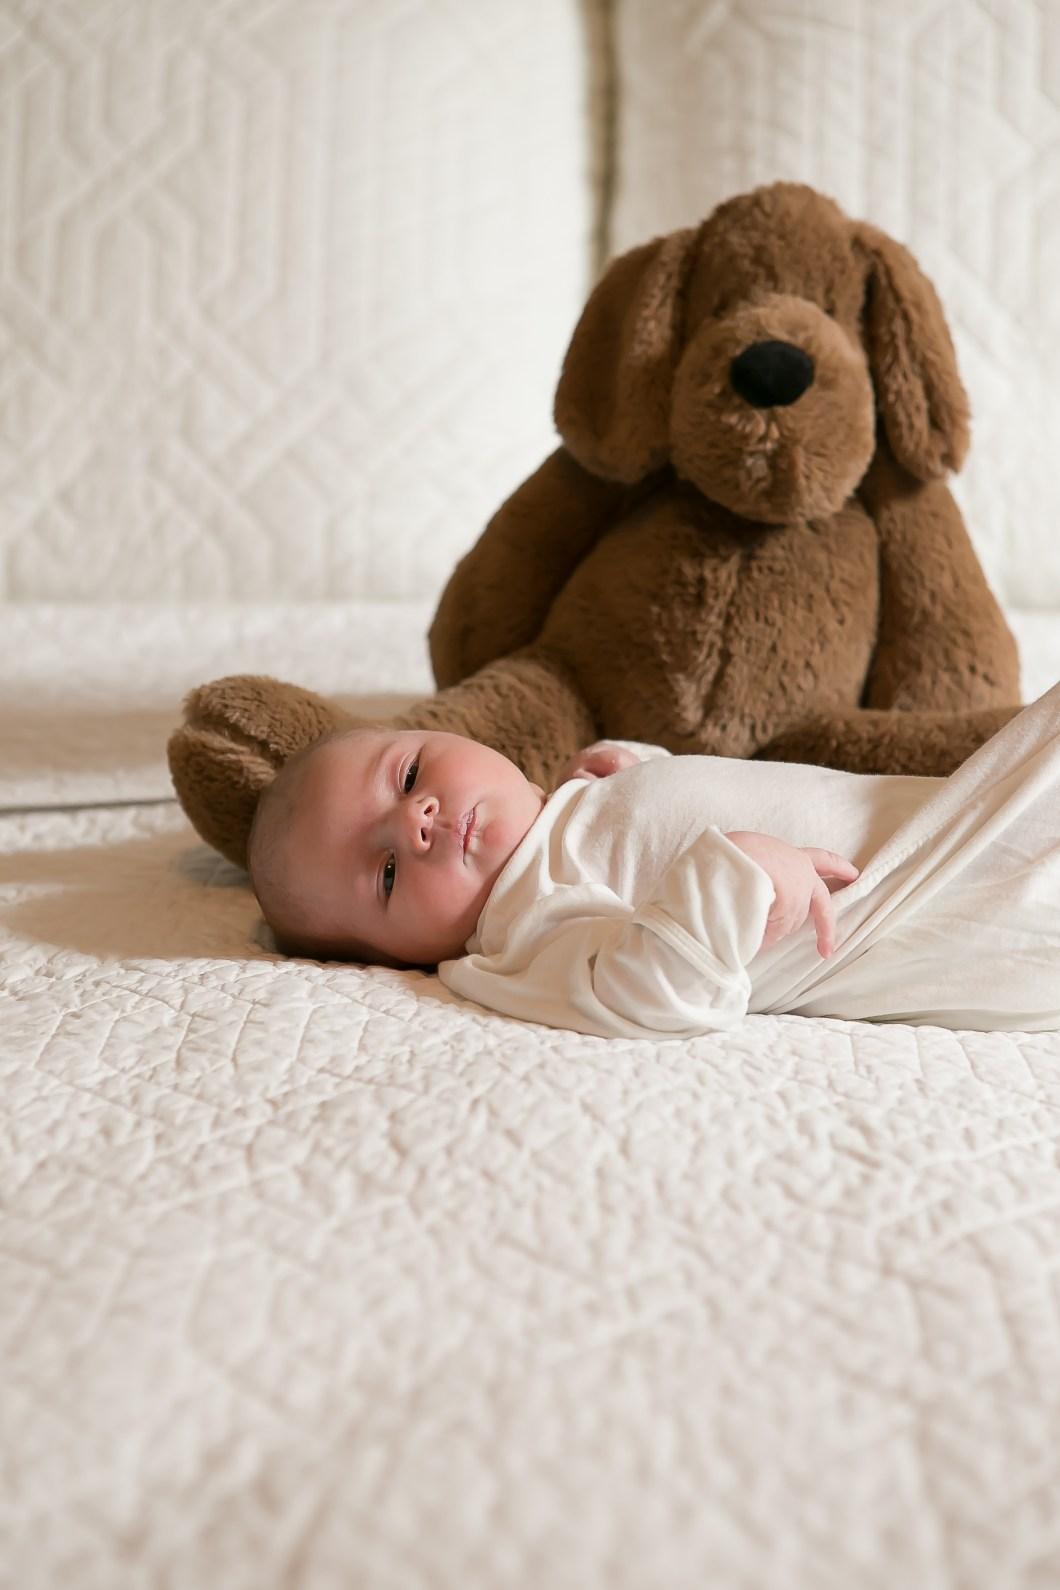 Atascocita Newborn Photographer